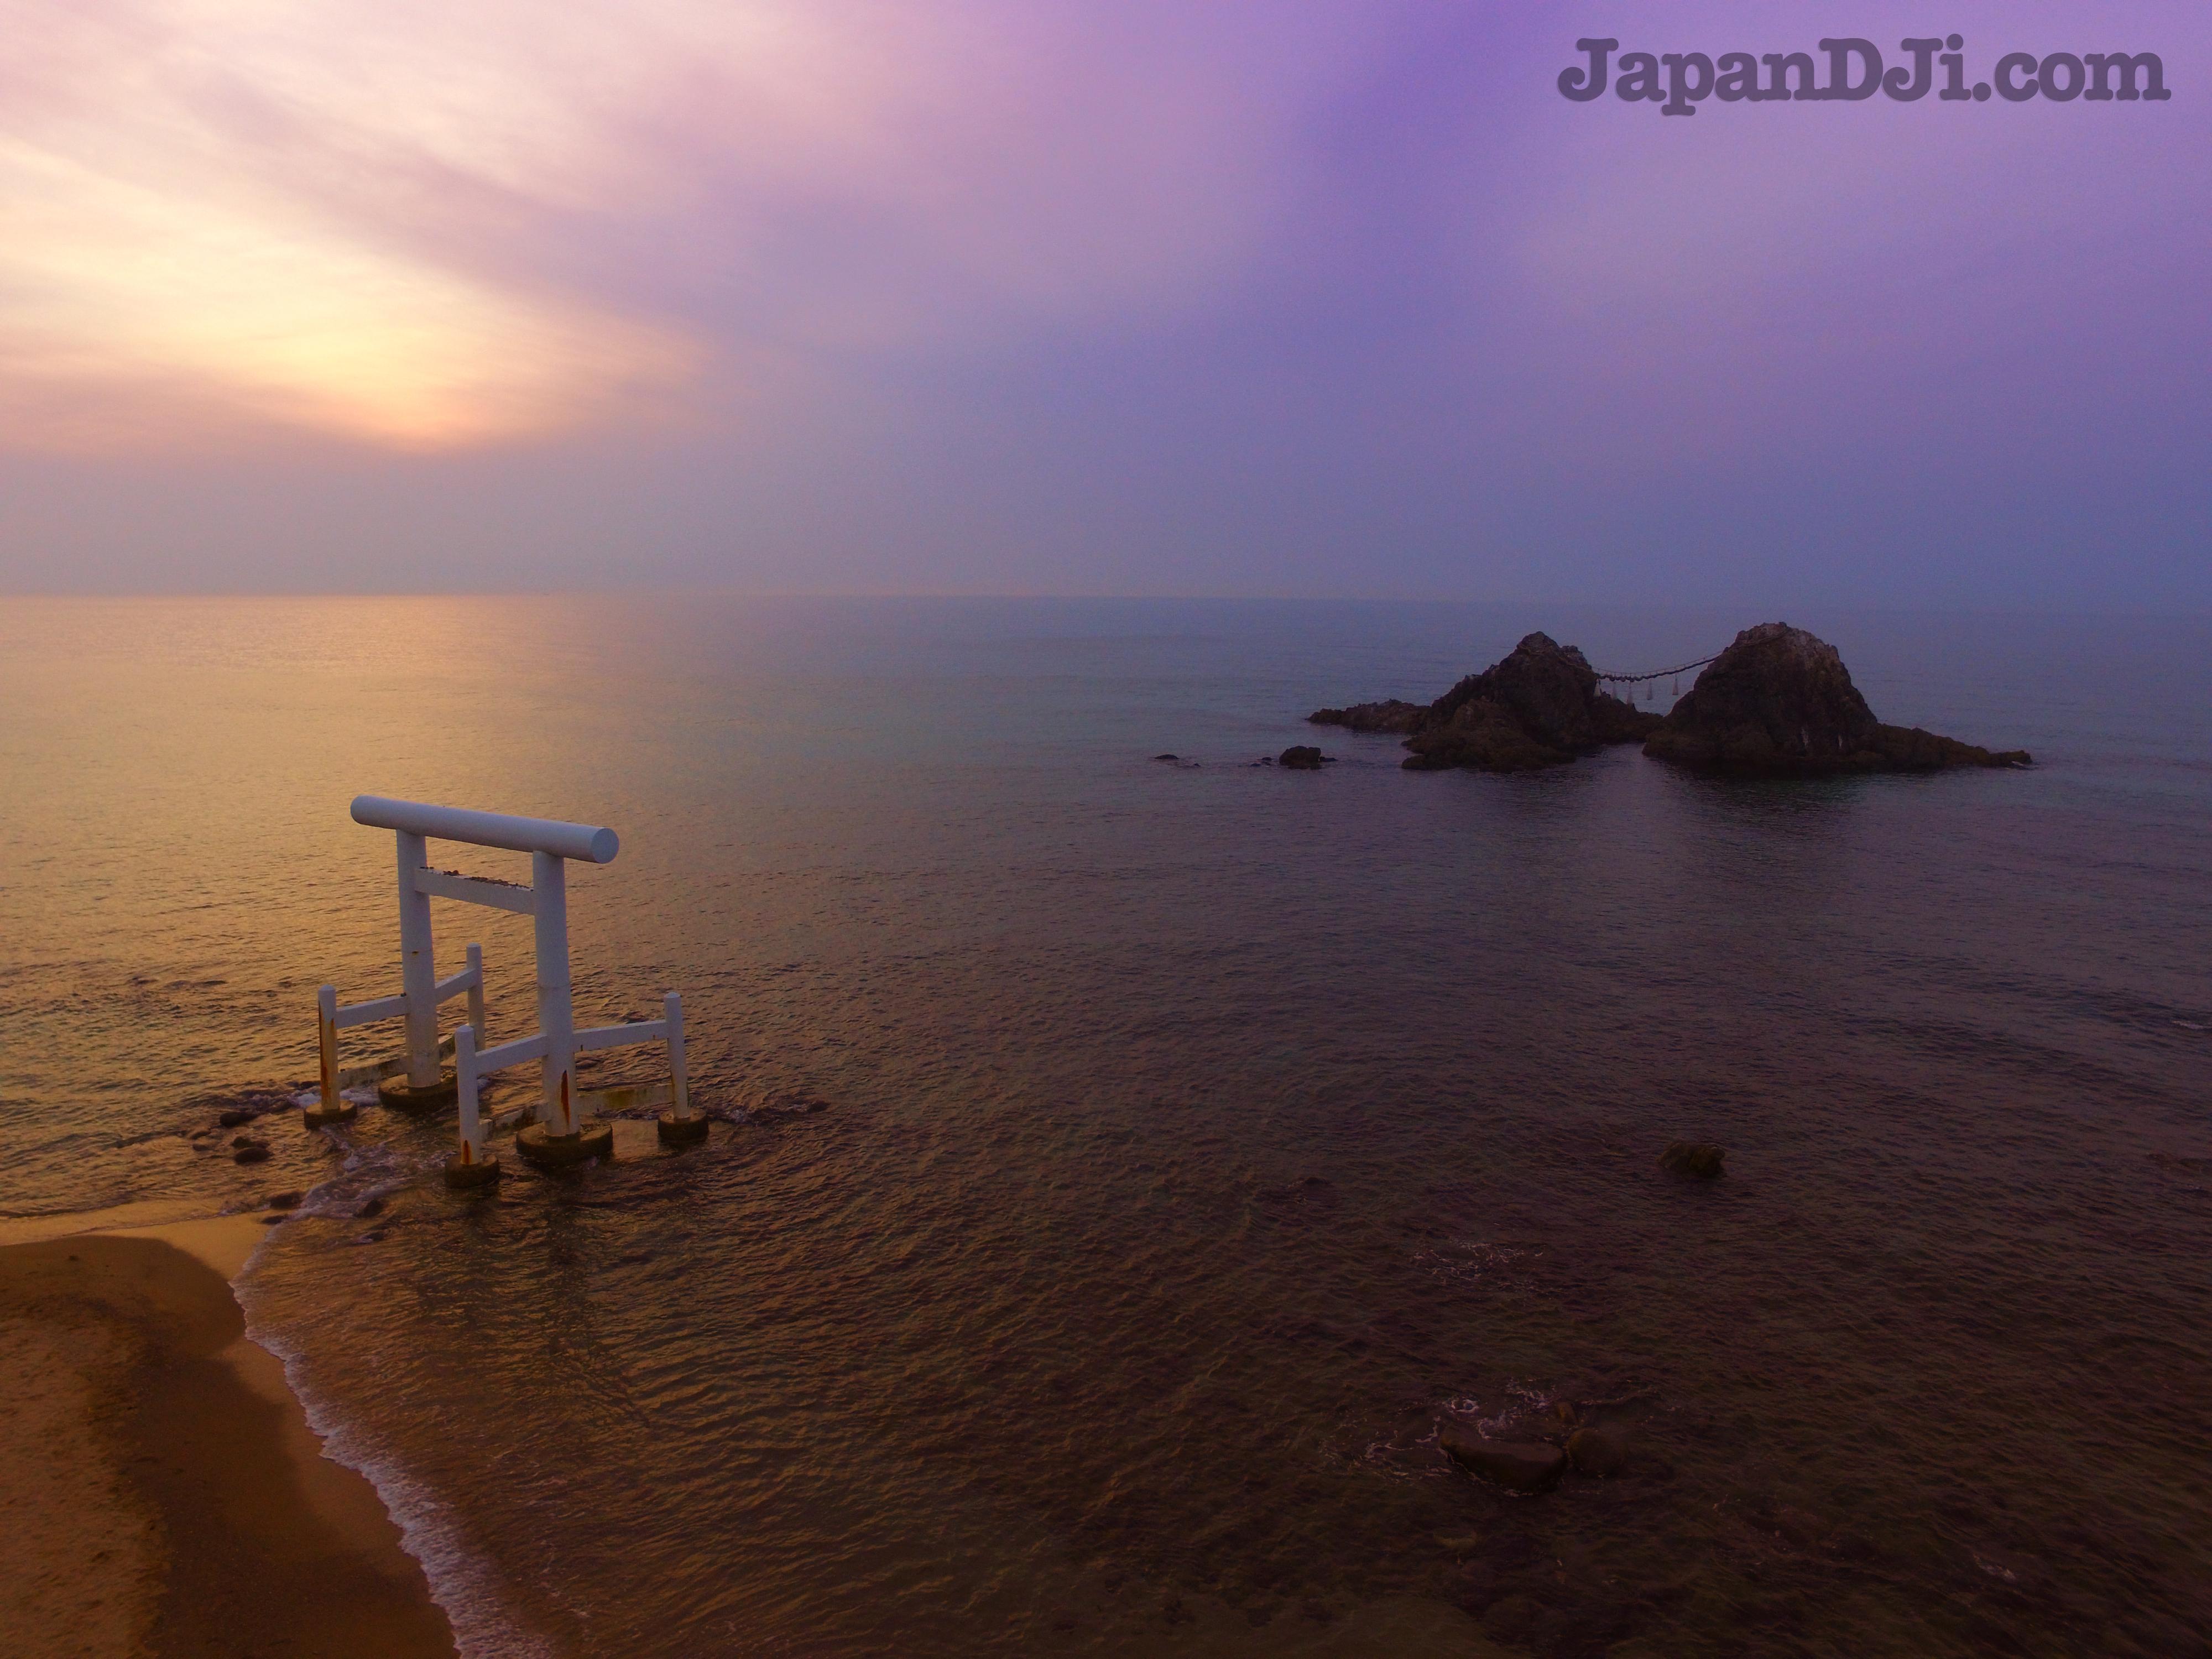 Shrine and Island